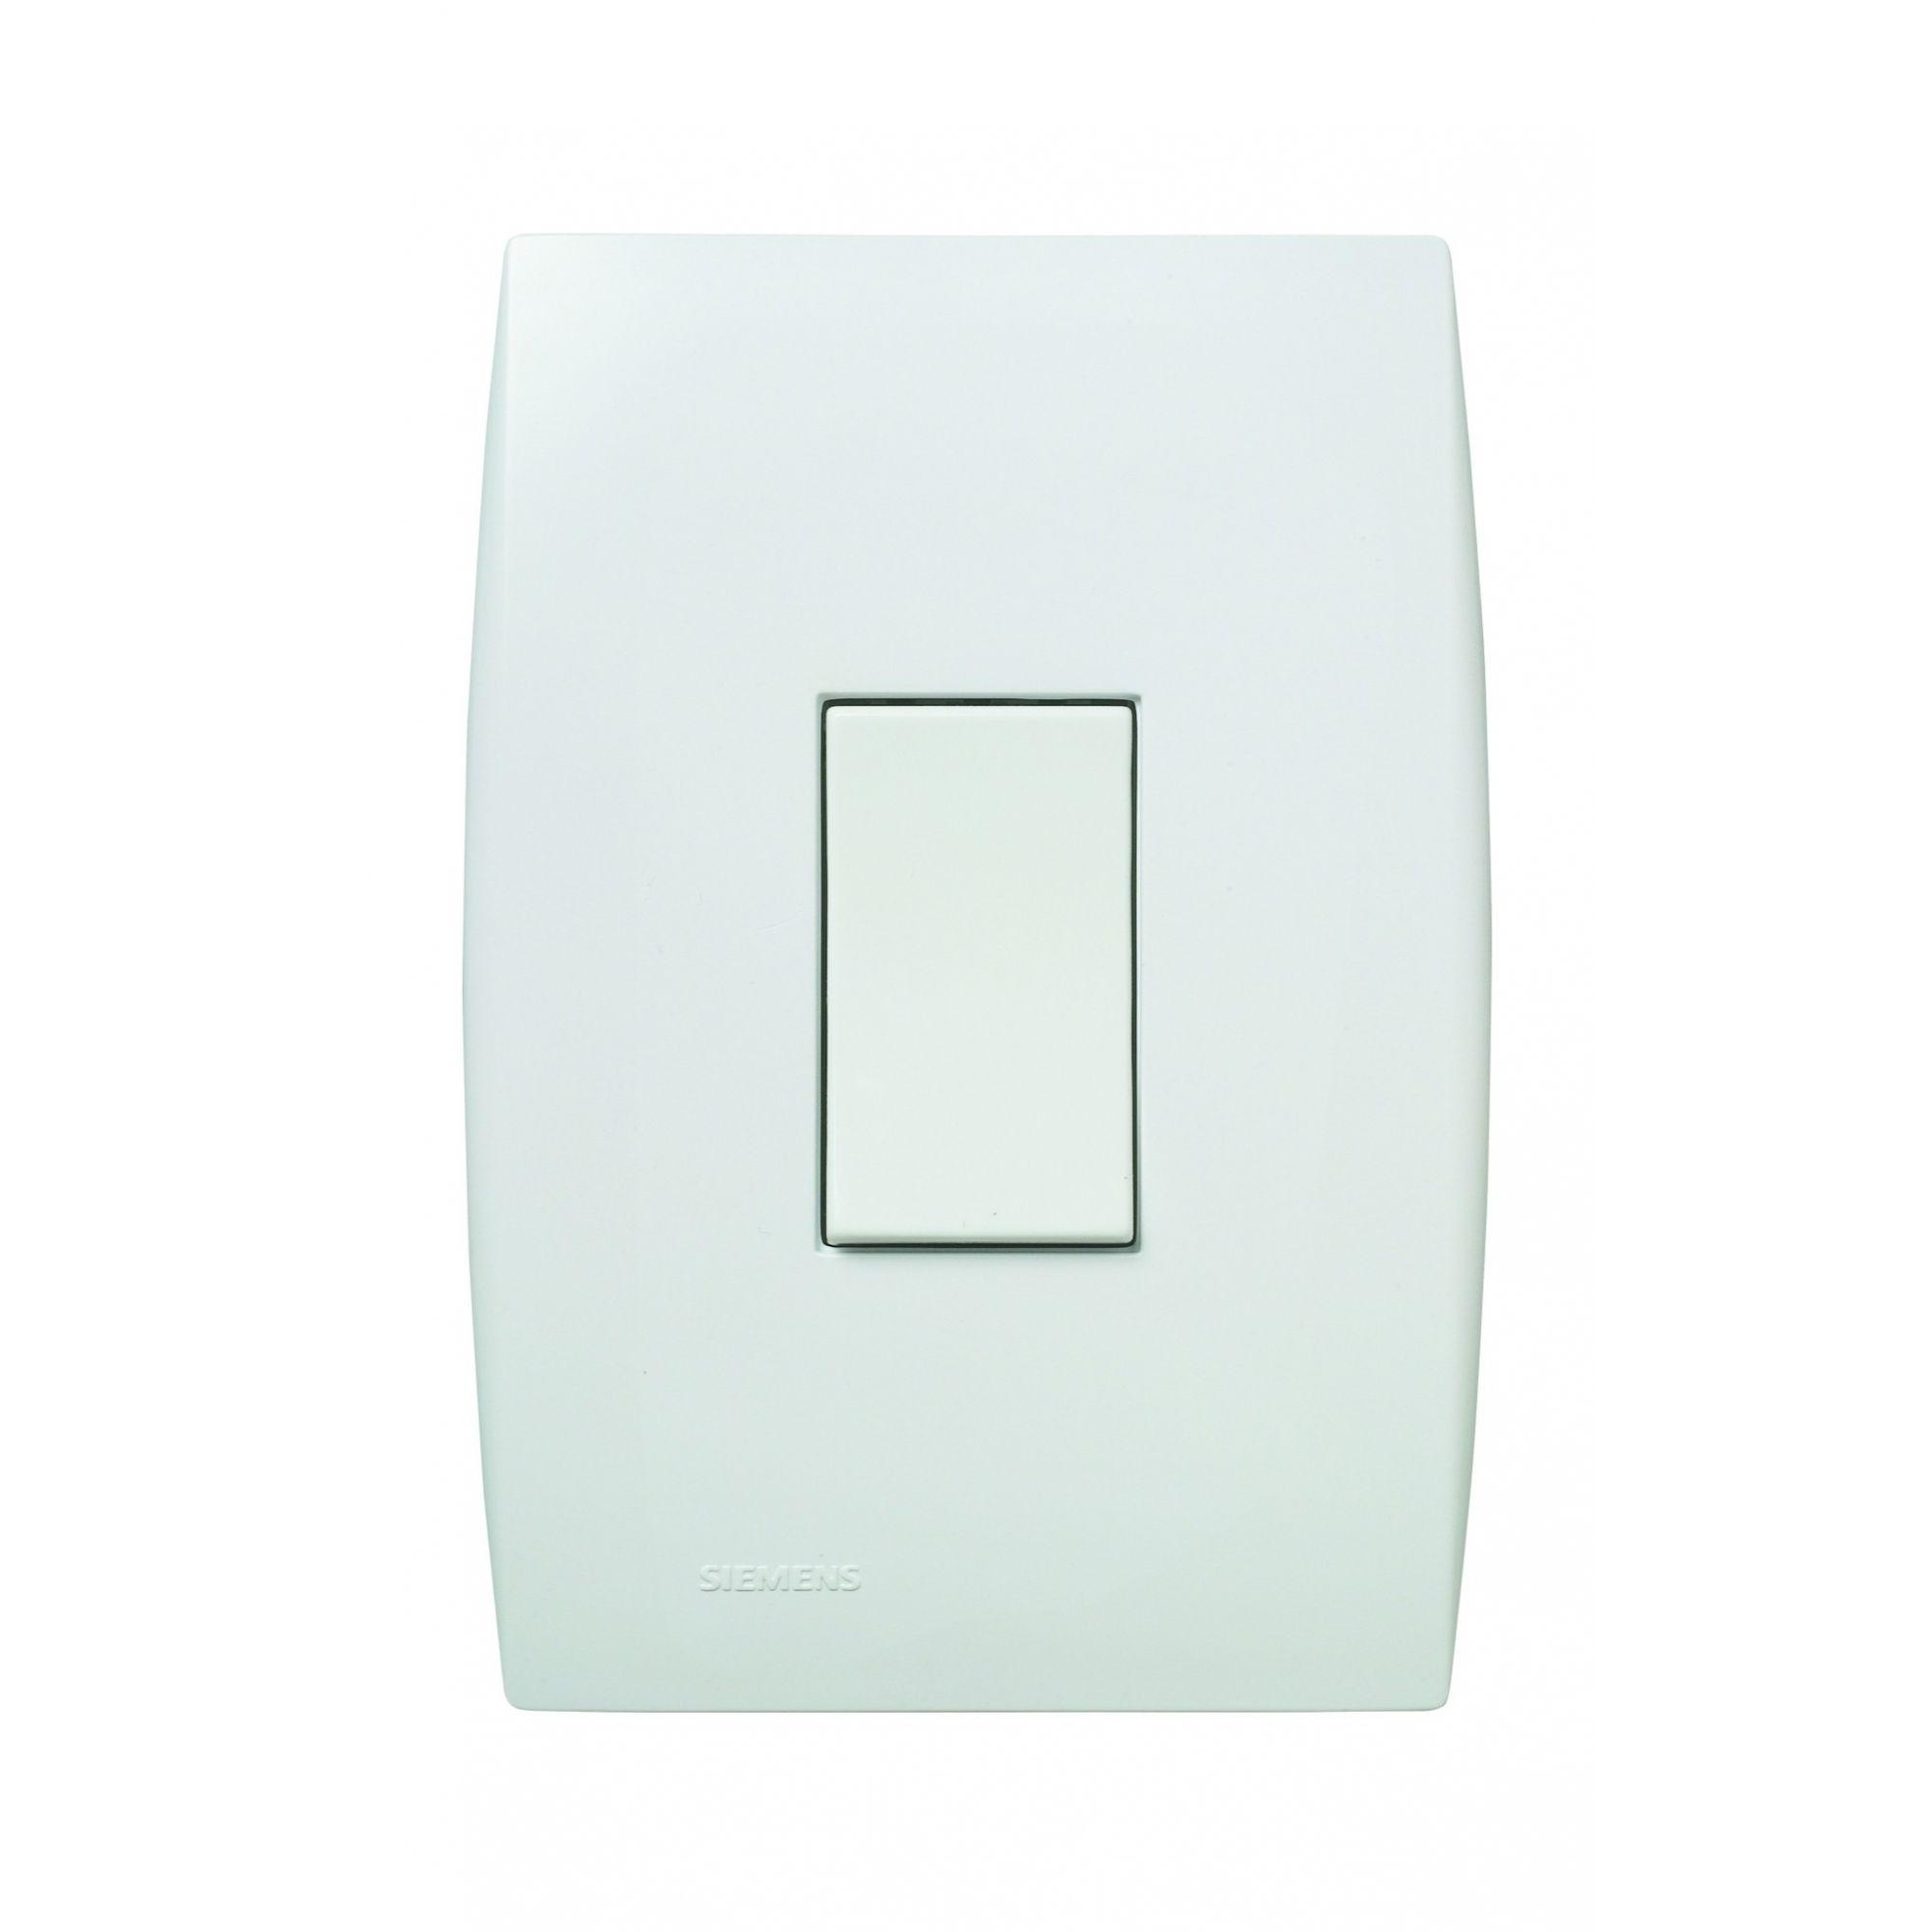 Interruptor 1SS Vertical Ilus Branco 5TA9 9041 - Siemens